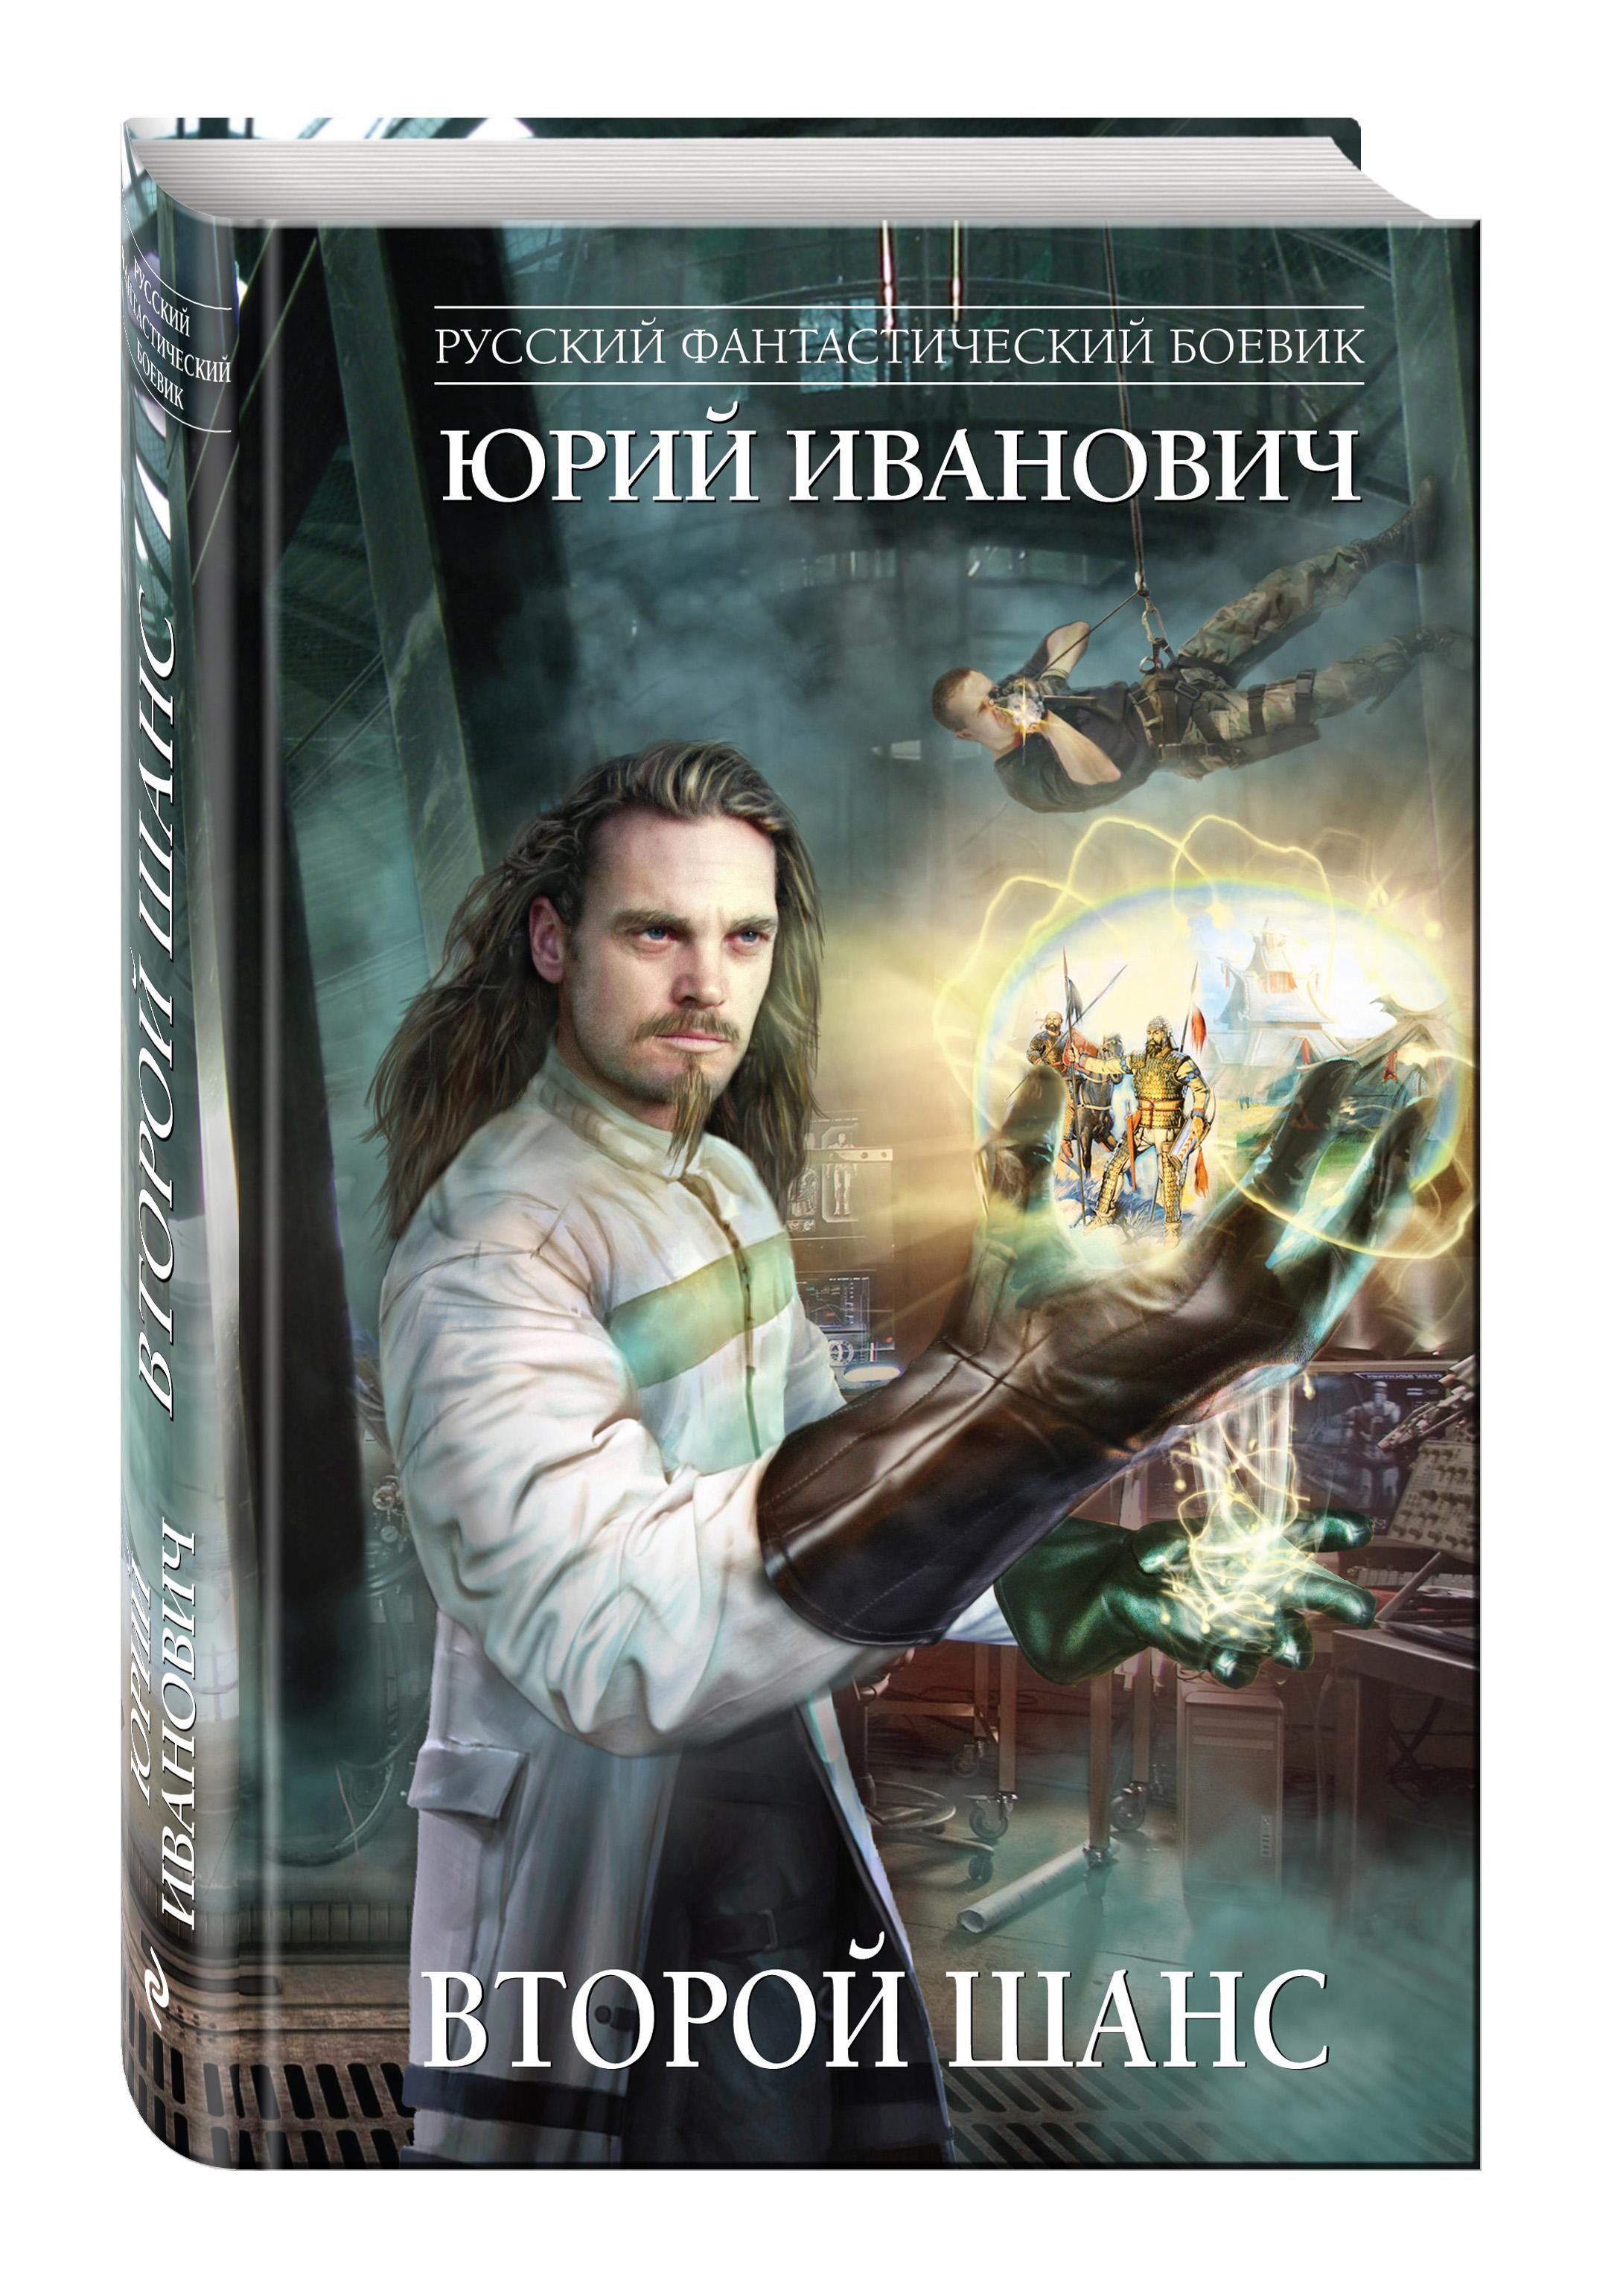 Иванович Ю. Второй шанс